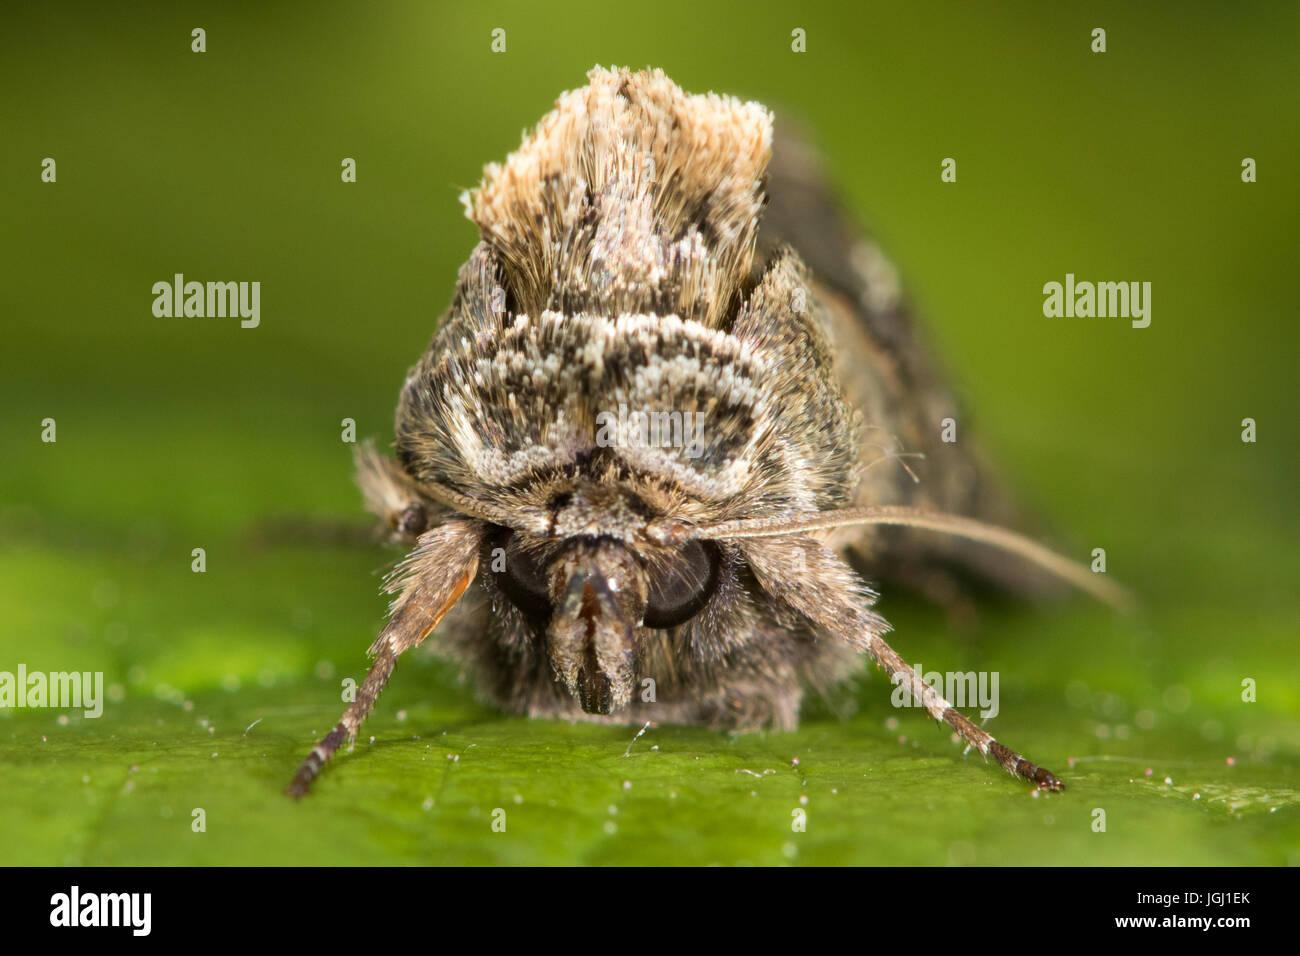 headshot of Spectacle moth (Abrostola tripartita) - Stock Image